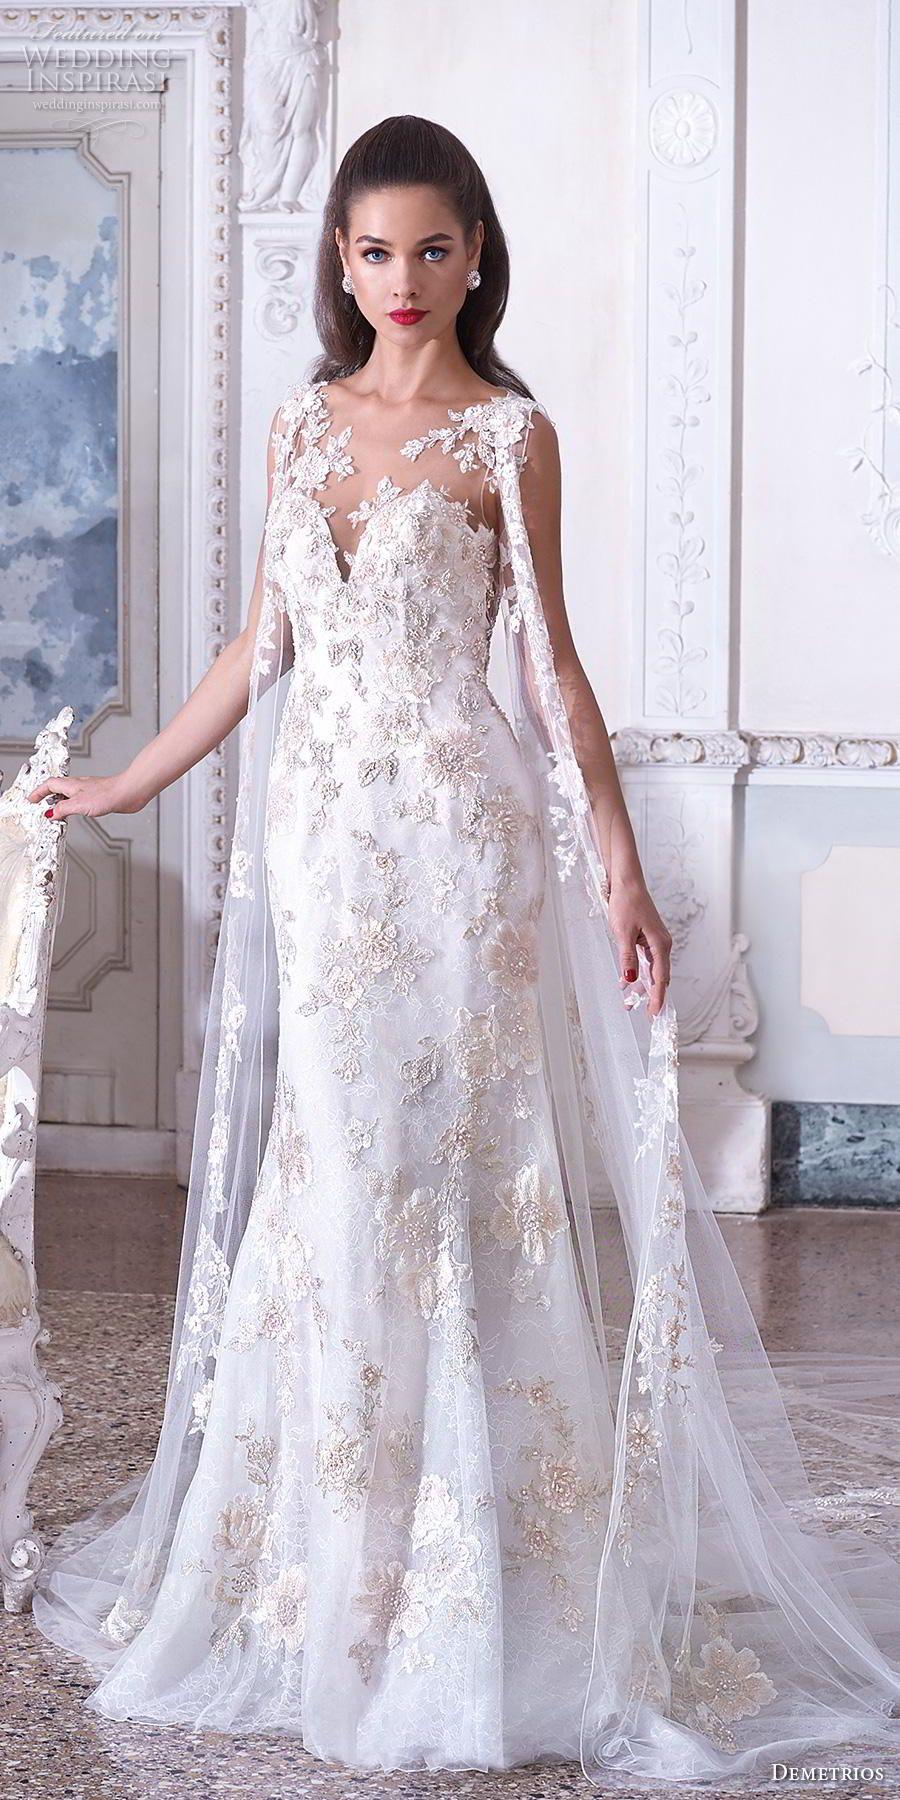 demetrios 2019 bridal sleeveless illusion bateau deep sweetheart neckline  full embellishment glamorous elegant fit and flare trumpet wedding dress  with cape ... 8bb44e409193